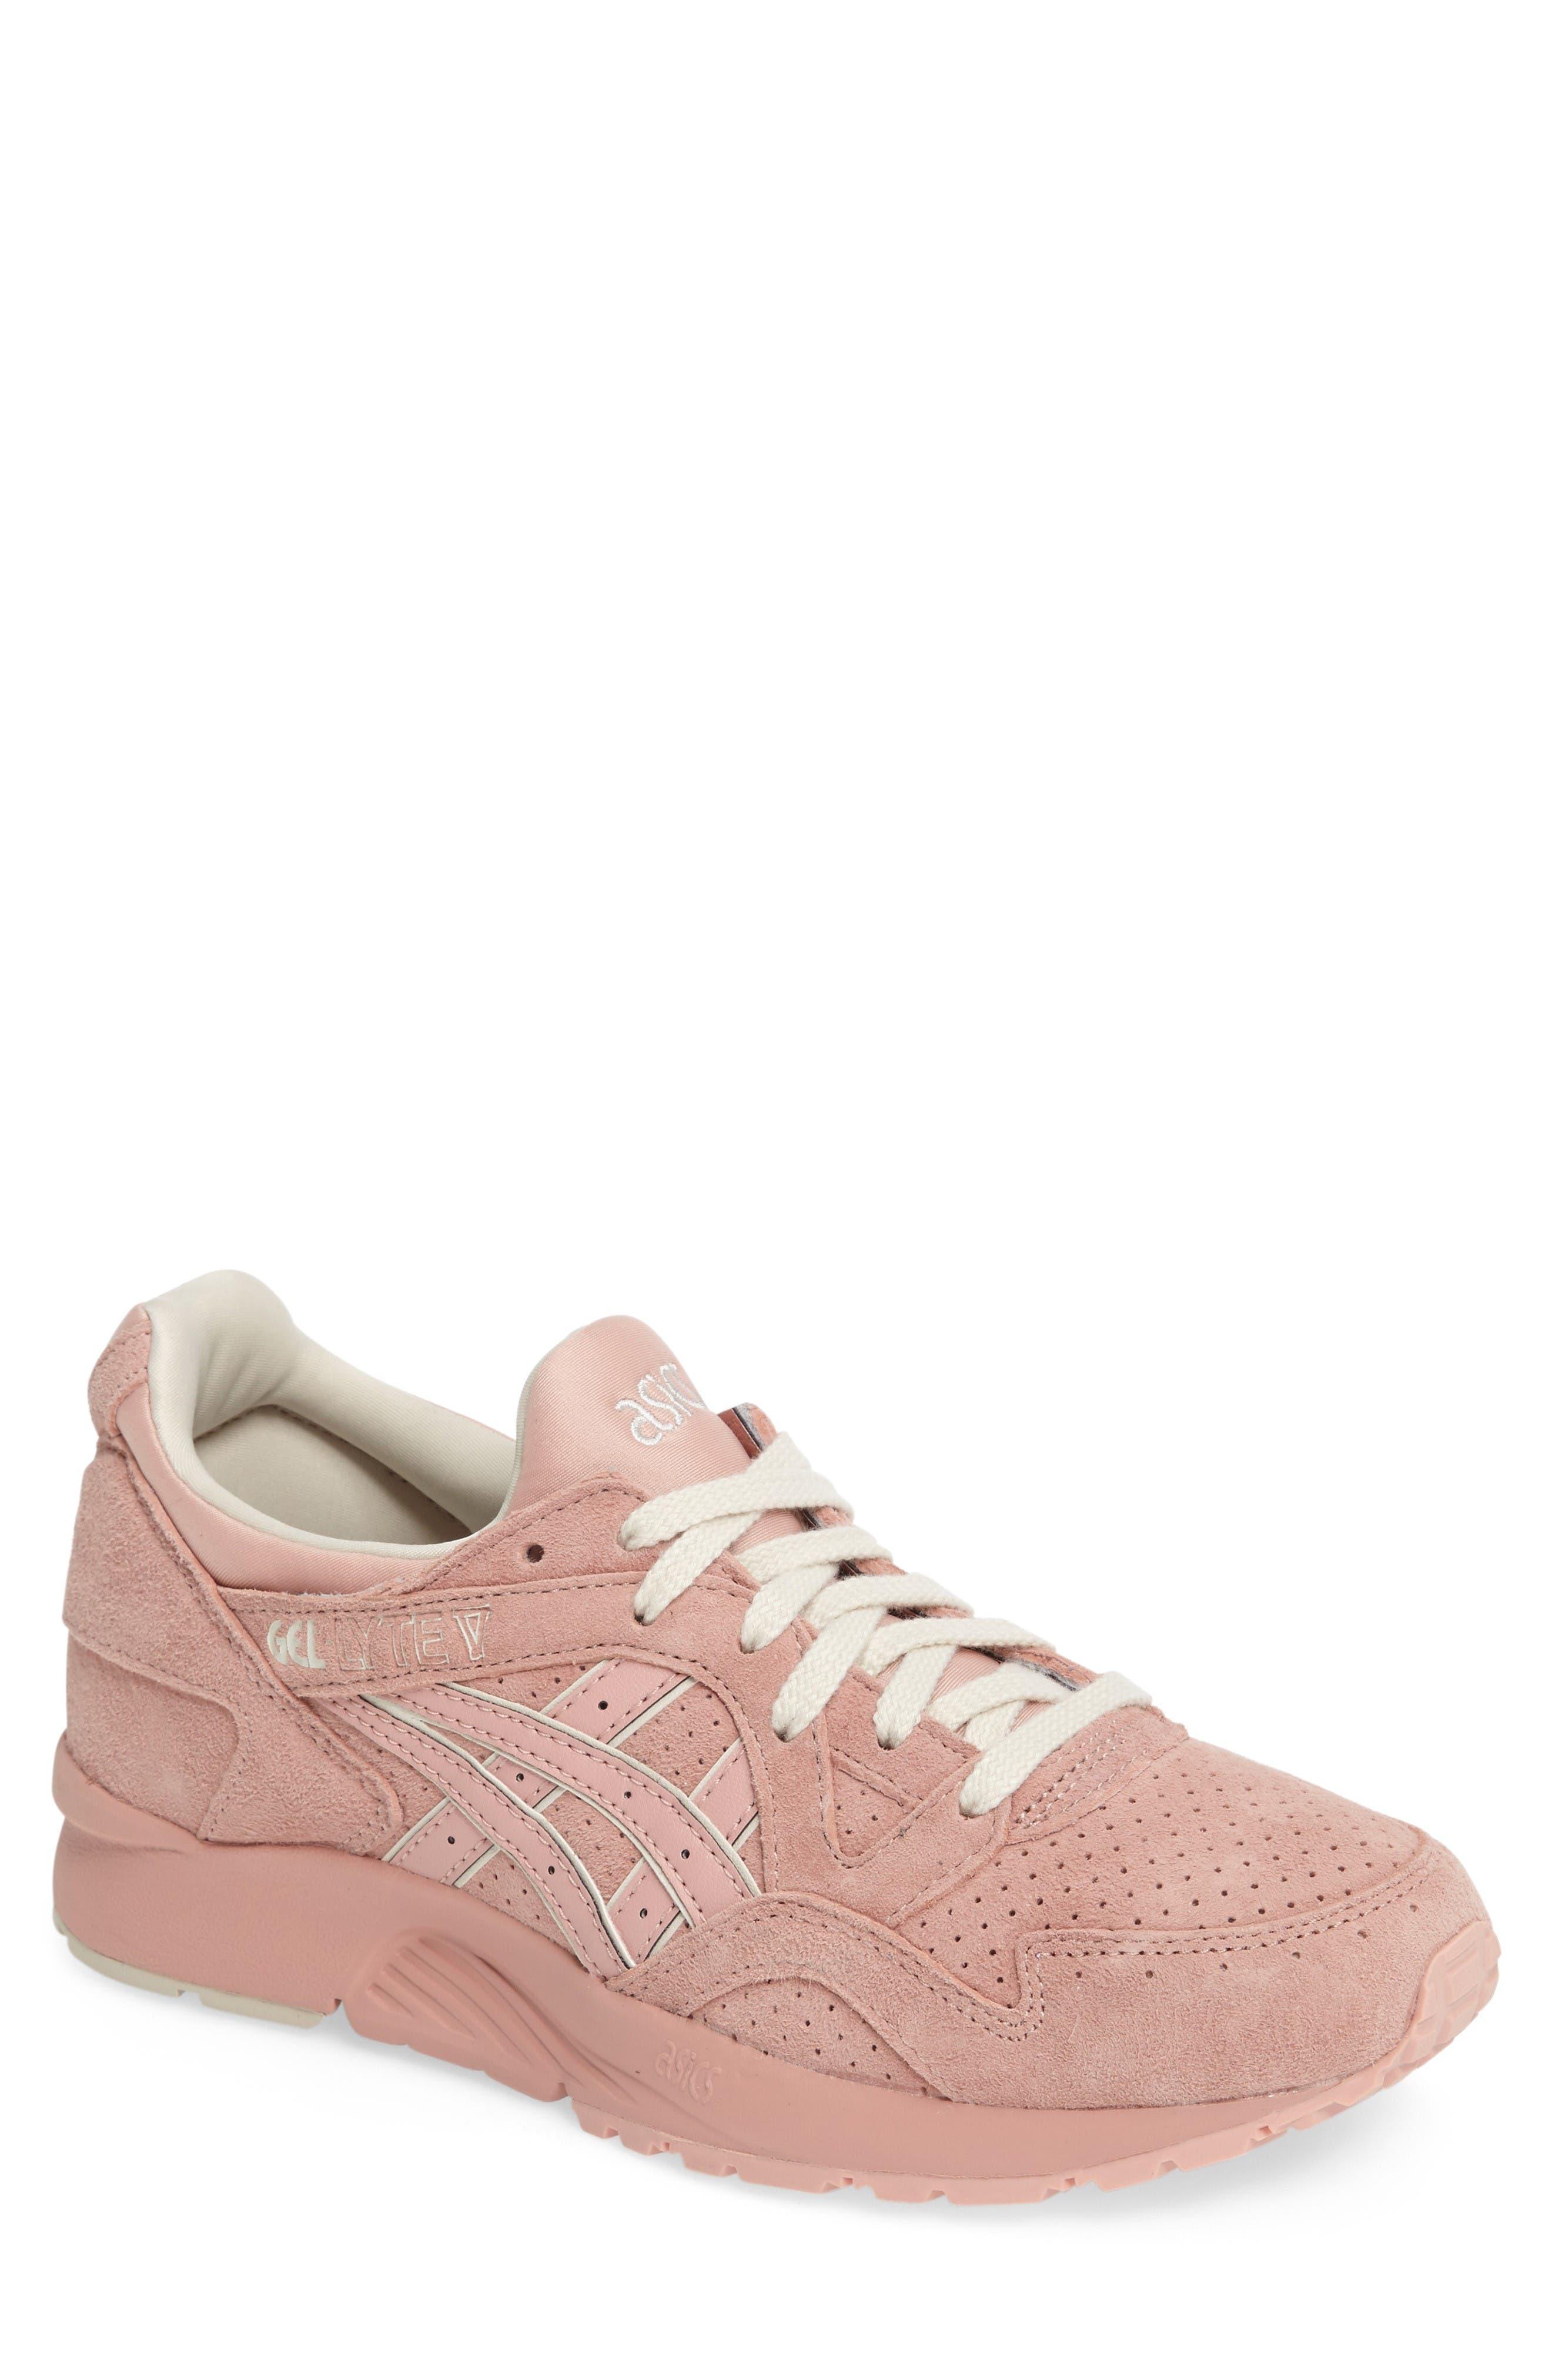 GEL-Lyte V Sneaker,                         Main,                         color, Peach Beige/ Peach Beige